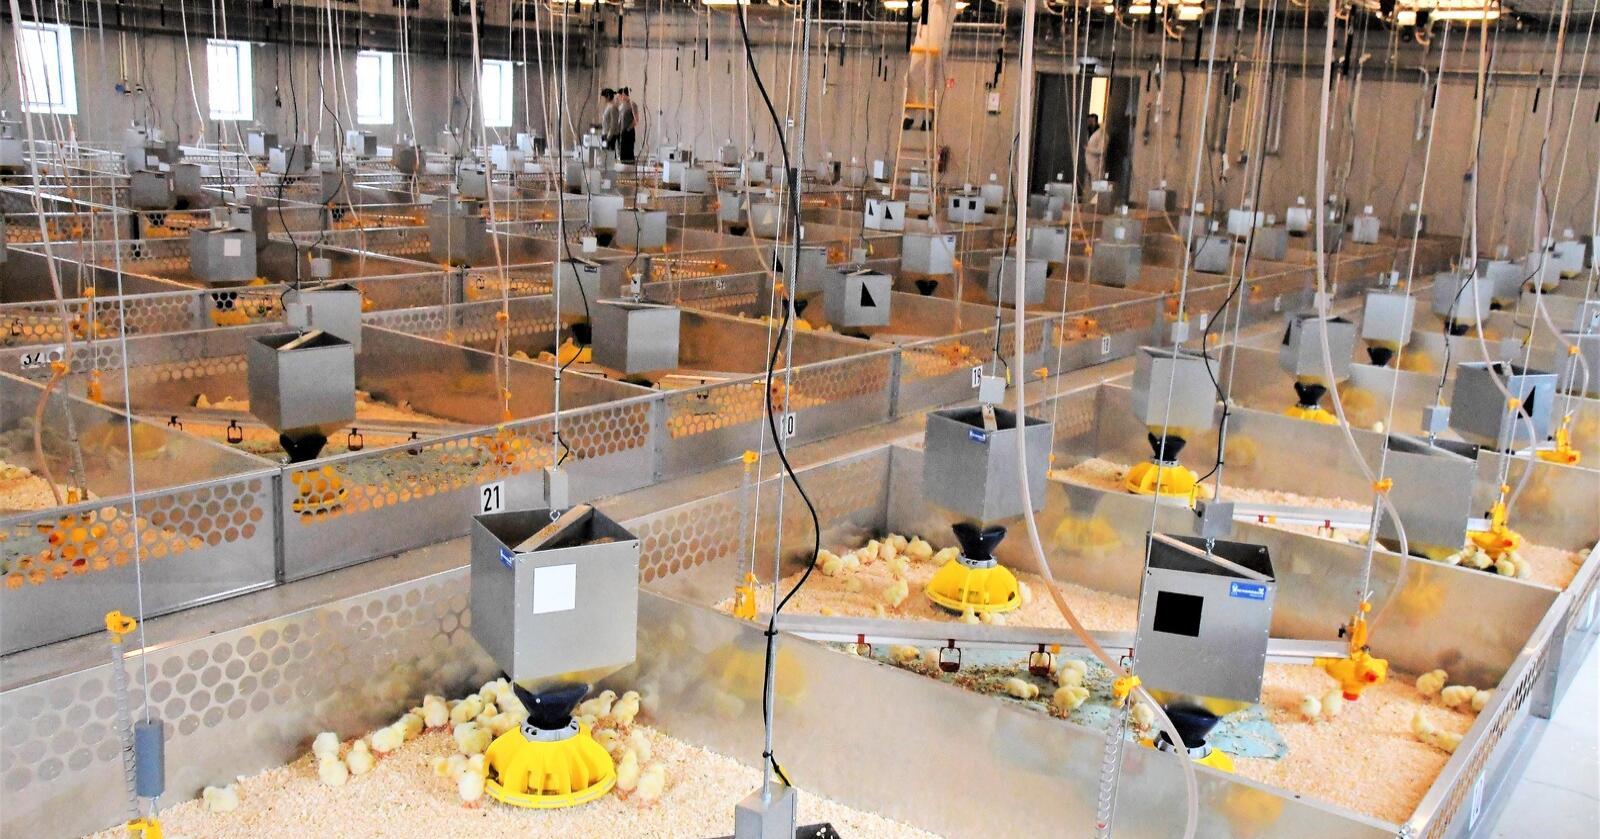 I hovedavdelingen på Fjørforsk er det plass til 6000 slaktekyllinger. Bygget har også mindre avdelinger hvor det kan tilrettelegges for verpehøns. Foto: Kai Ole Hänsch